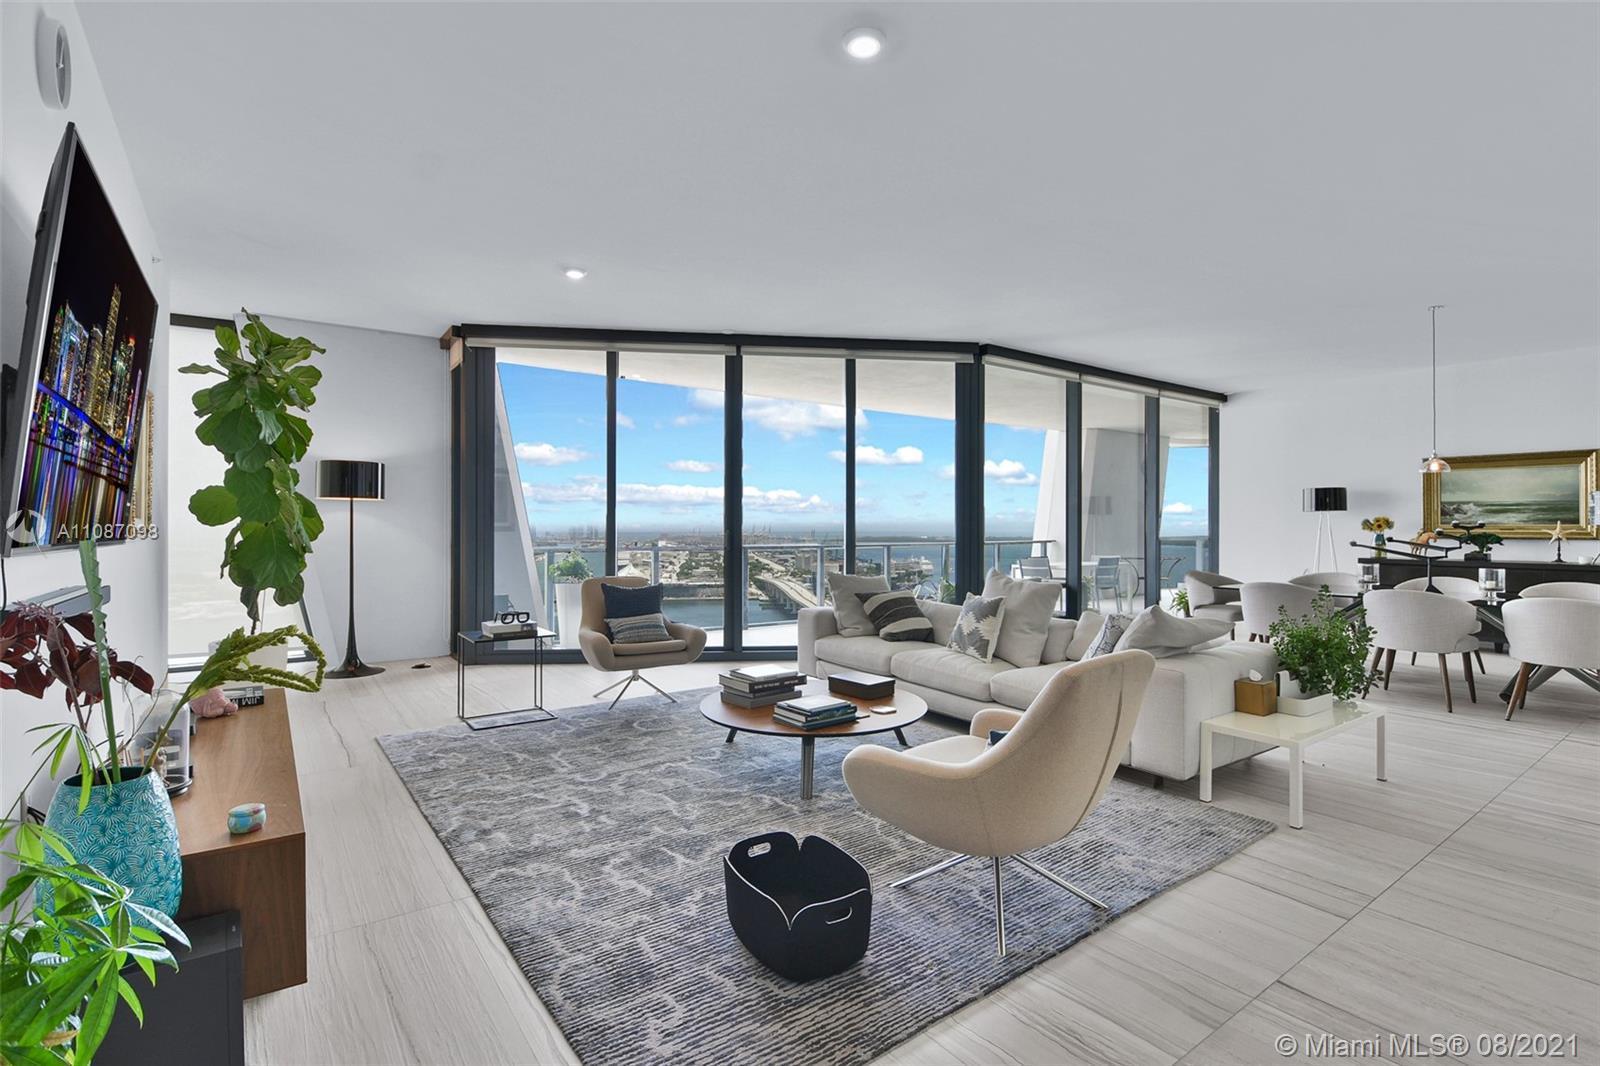 Luxury building One Thousand Museum legendary architecture by Zaha Hadid, Miami's most prestigious r